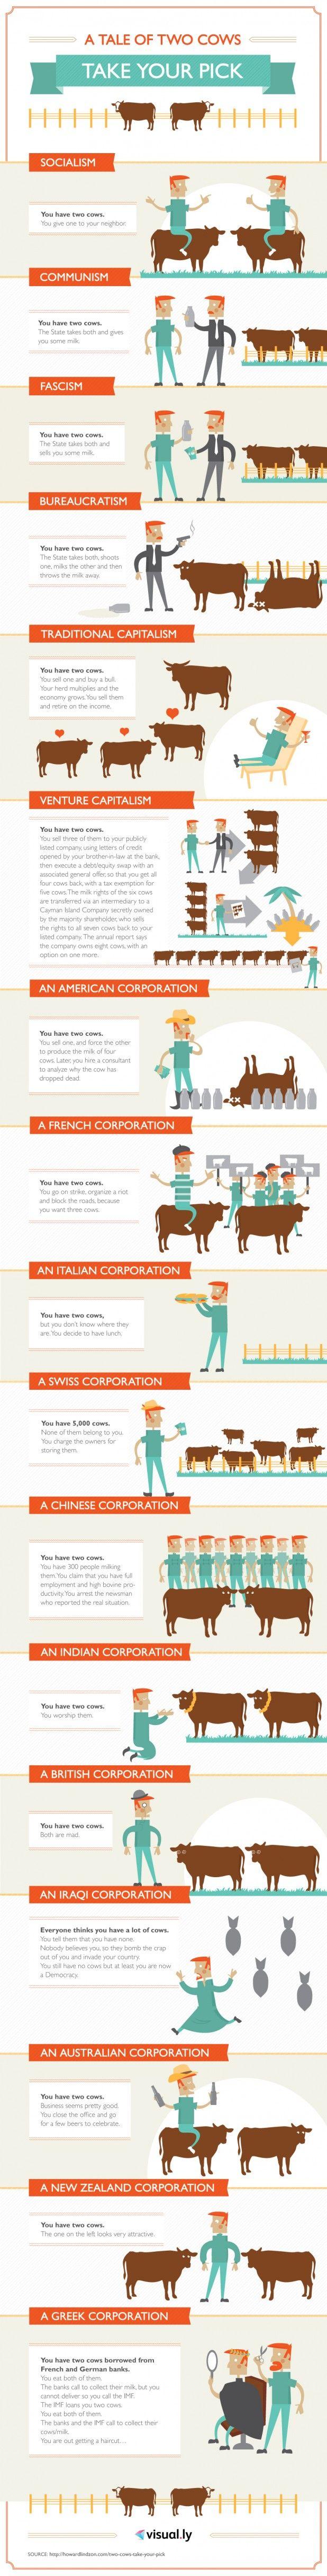 A Tale of two Cows als Paradebeispiel visuellen Storytellings